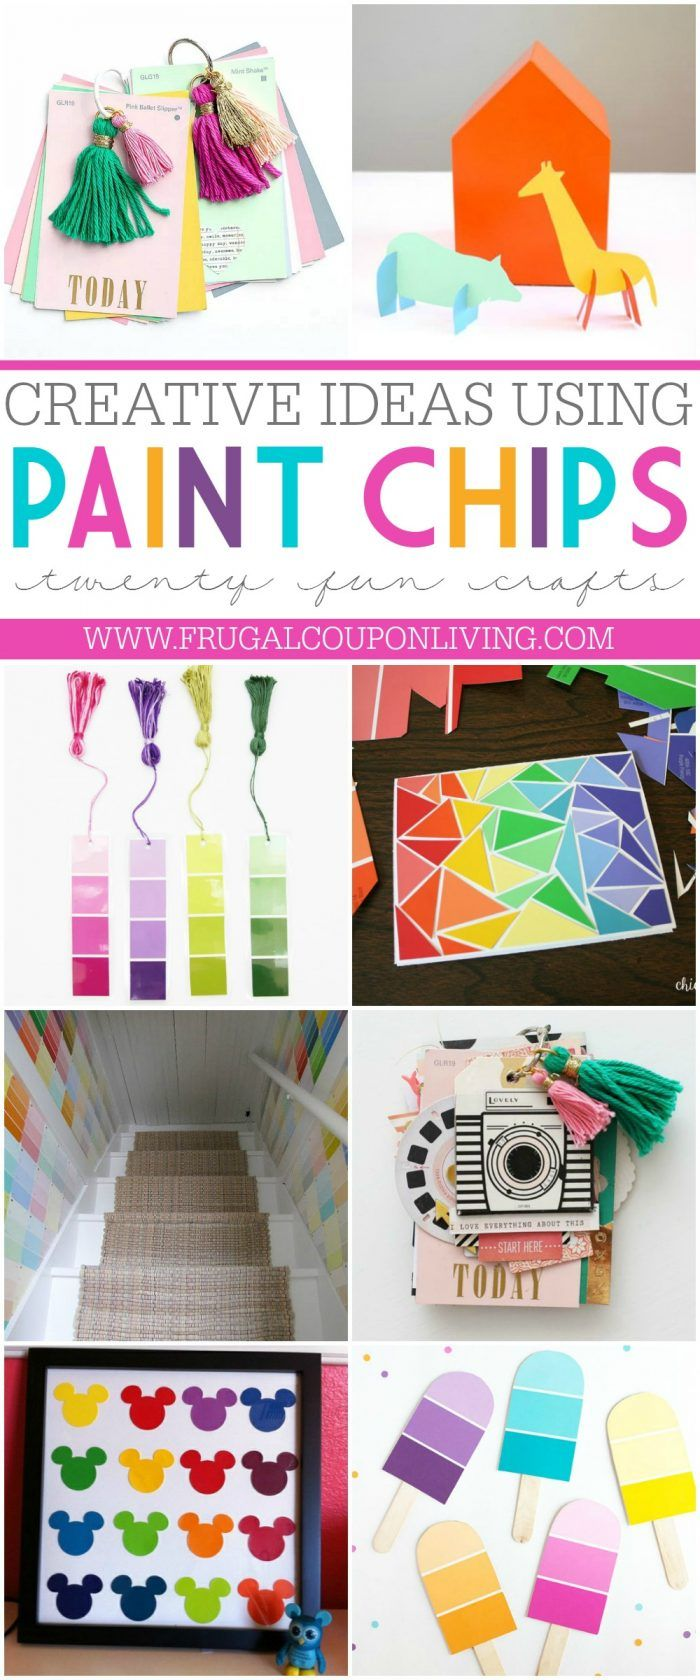 17 best ideas about paint chips on pinterest paint. Black Bedroom Furniture Sets. Home Design Ideas